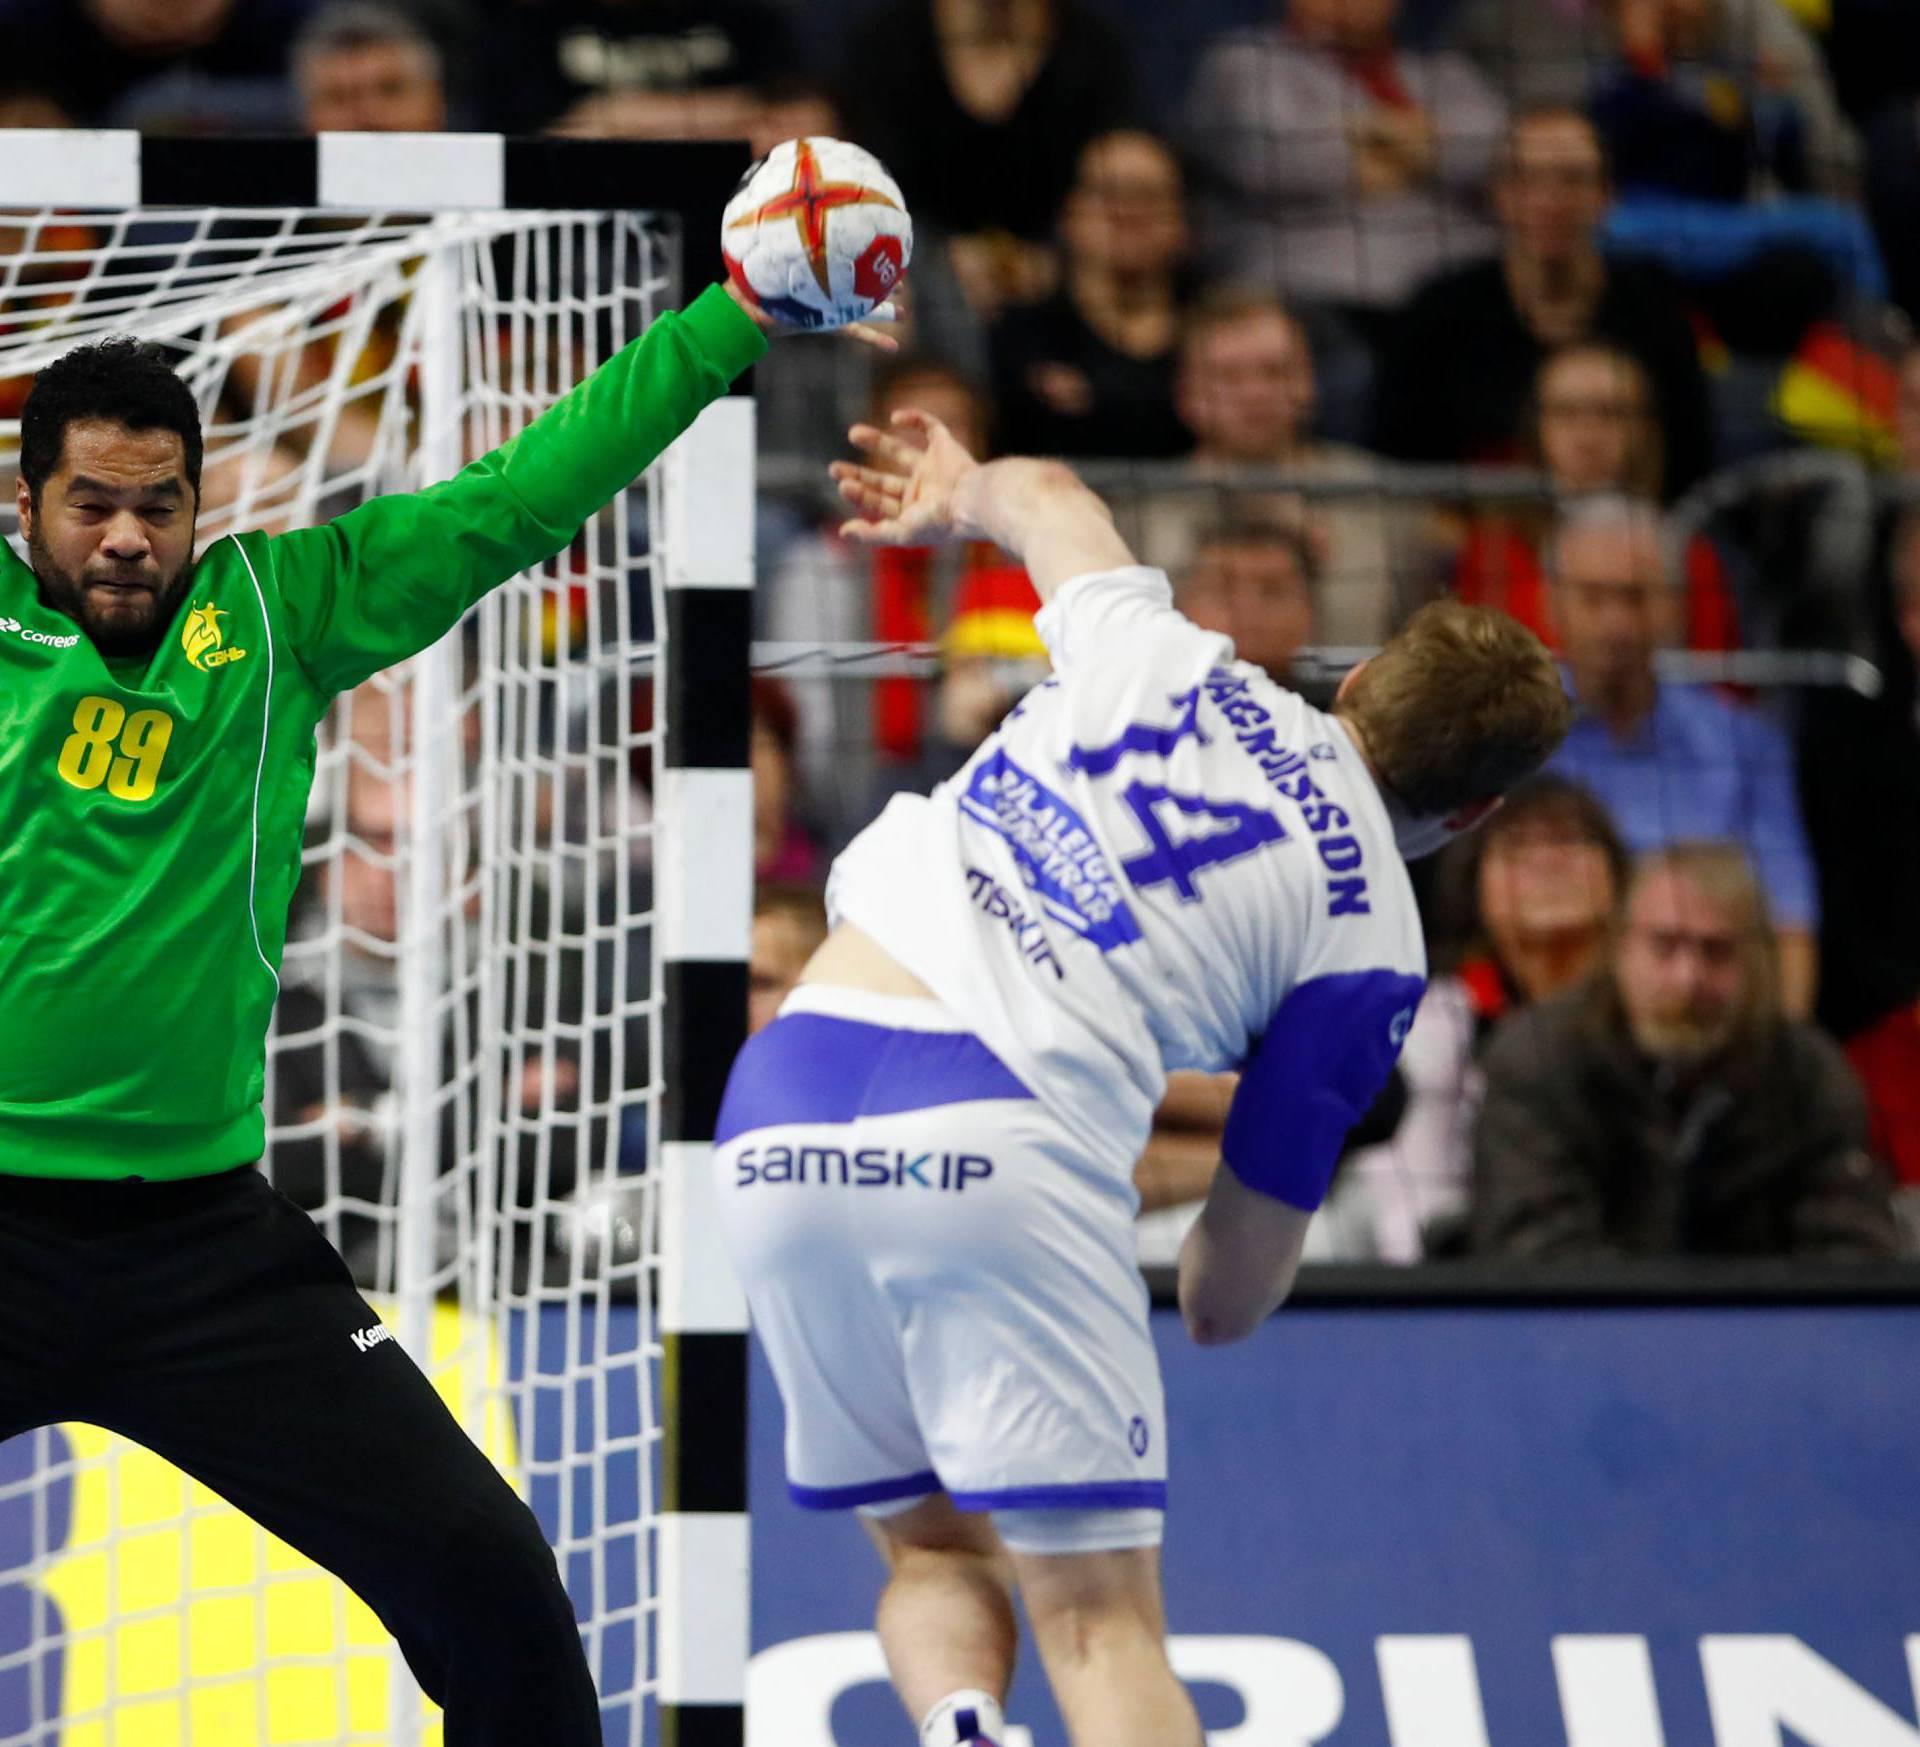 IHF Handball World Championship - Germany & Denmark 2019 - Main Round Group 1 - Brazil v Iceland